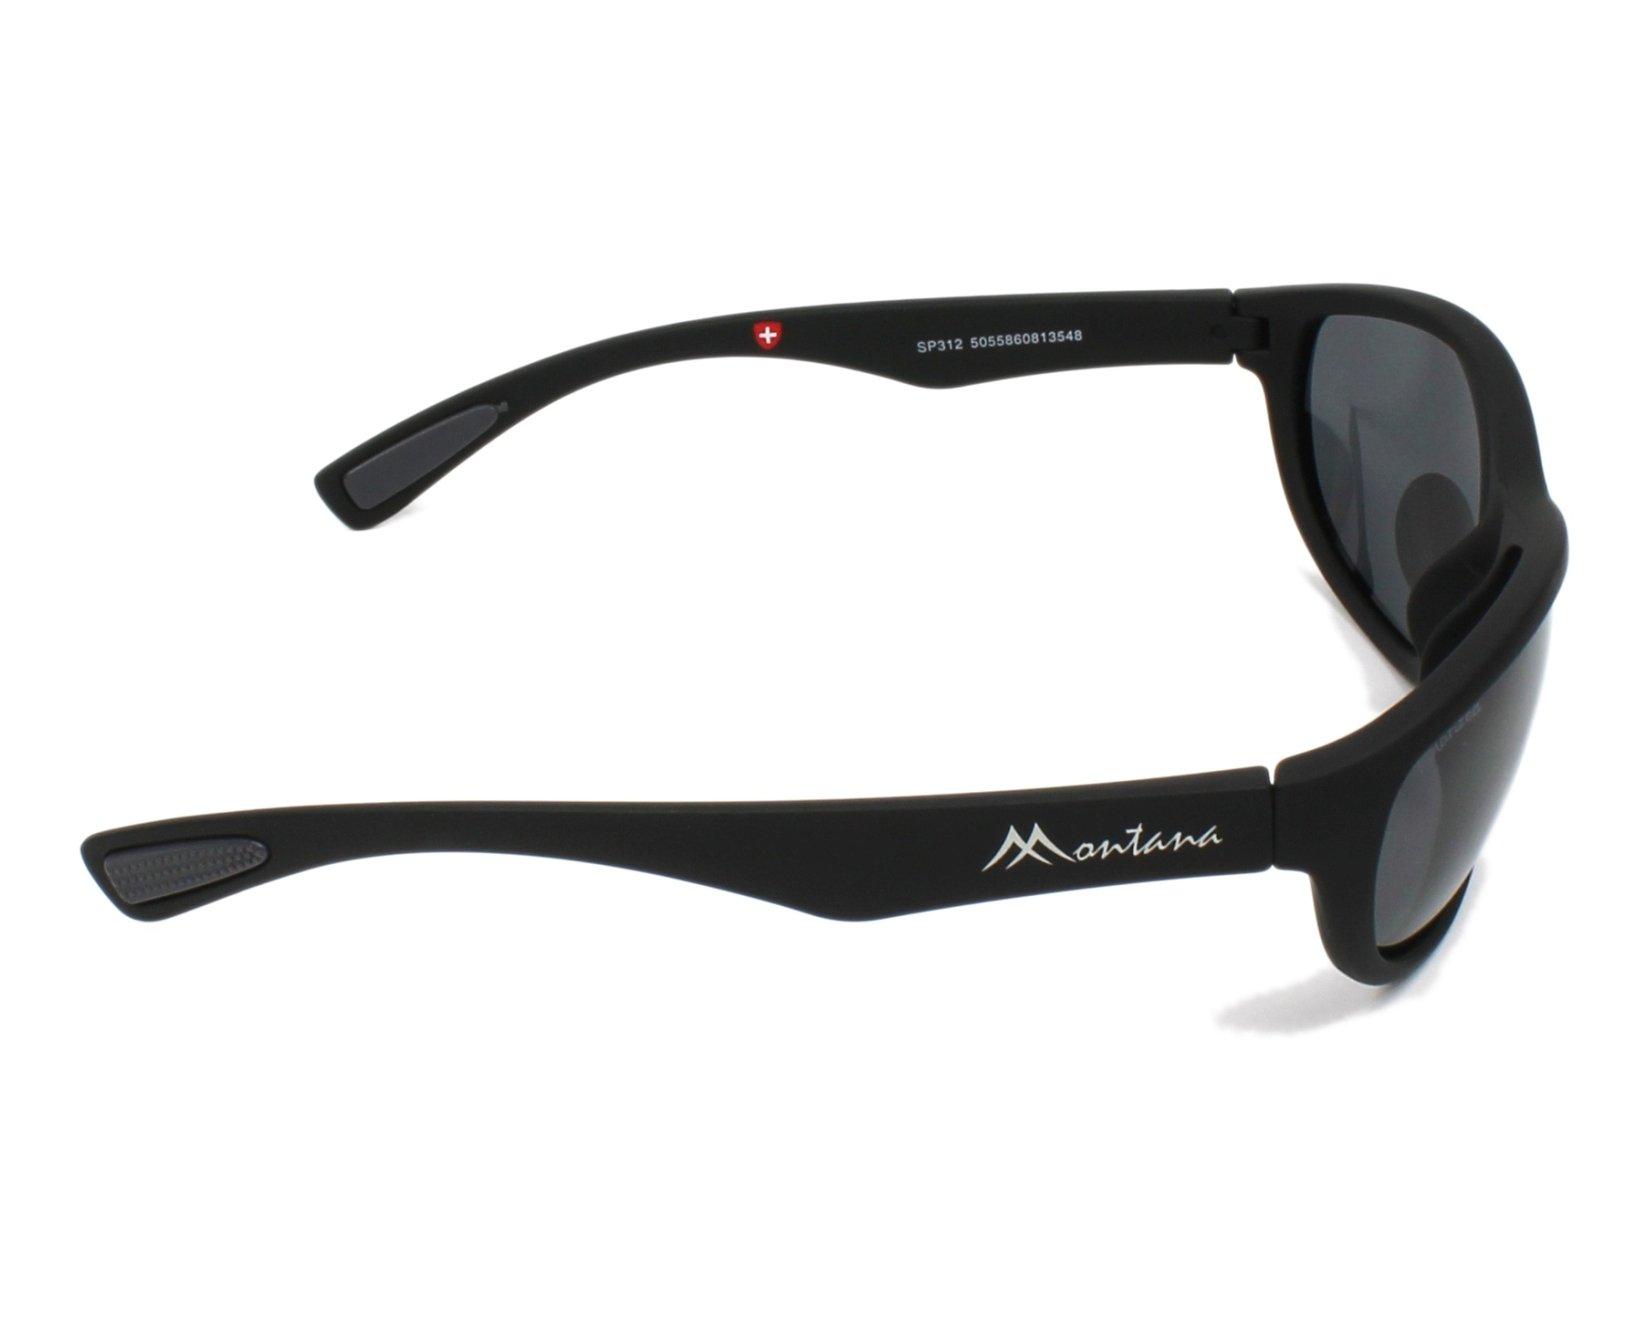 d18640506a Gafas de sol Montana SP-312 BLACK 63-14 Negra vista lateral